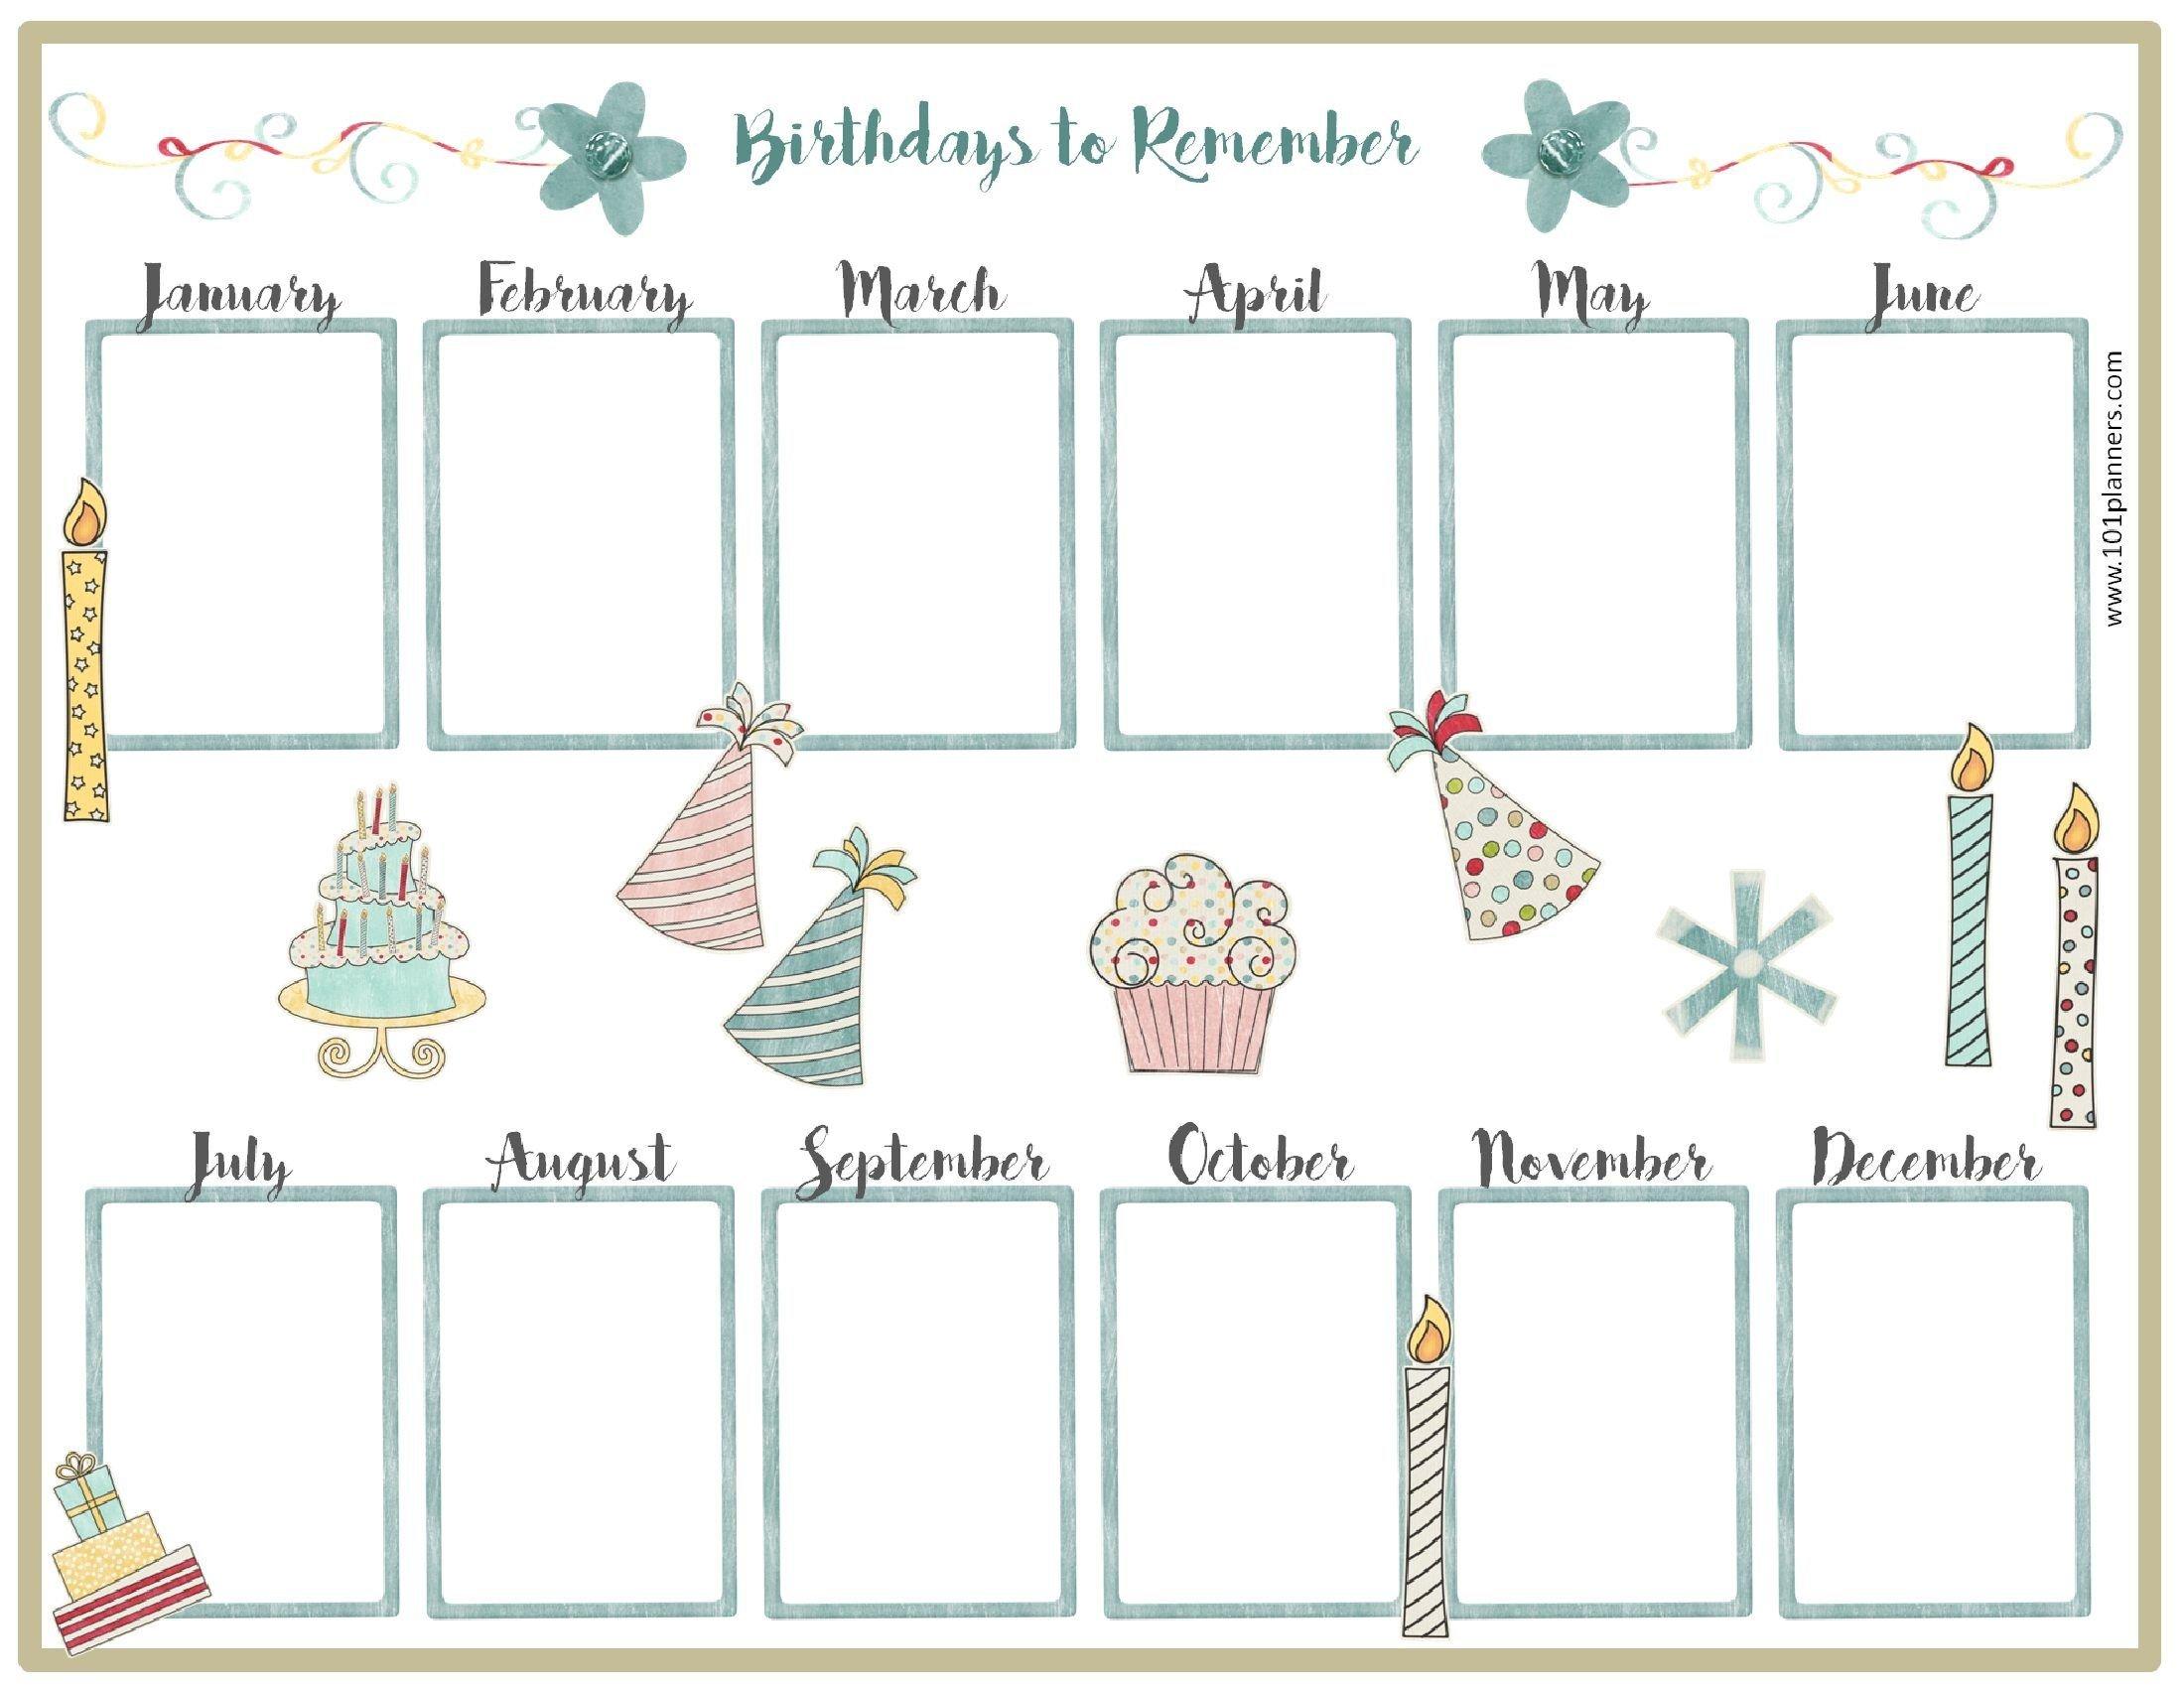 Birthday Calendar Template (С Изображениями) | День Рождения Free Birthday Calendar For The Workplace